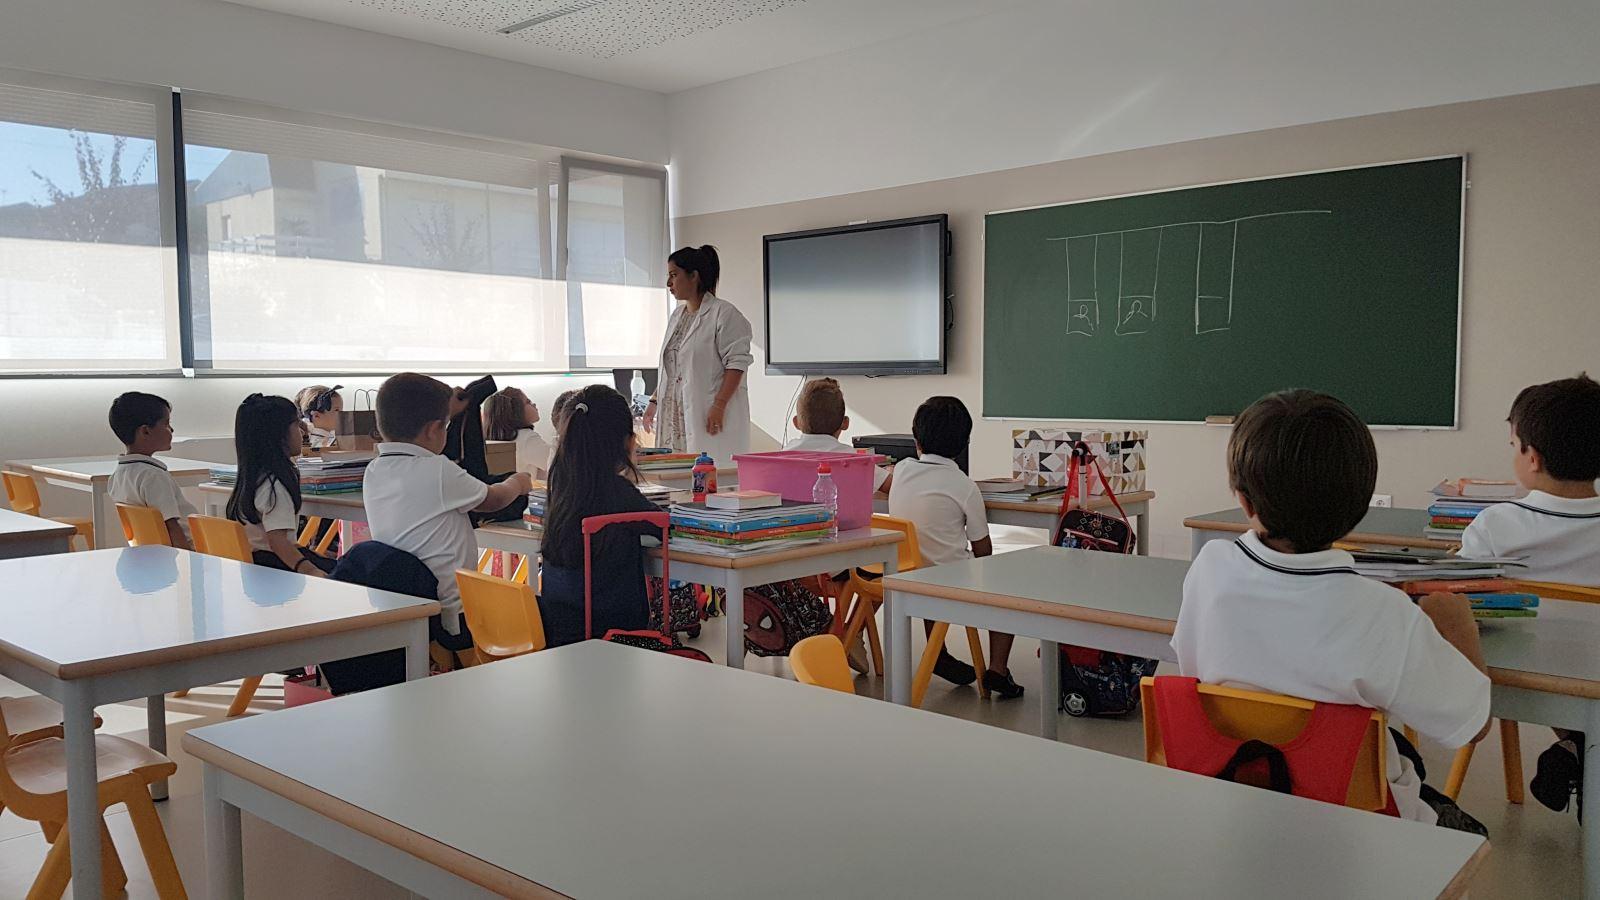 Vila Verde | Colégio de primeiro ciclo abre portas